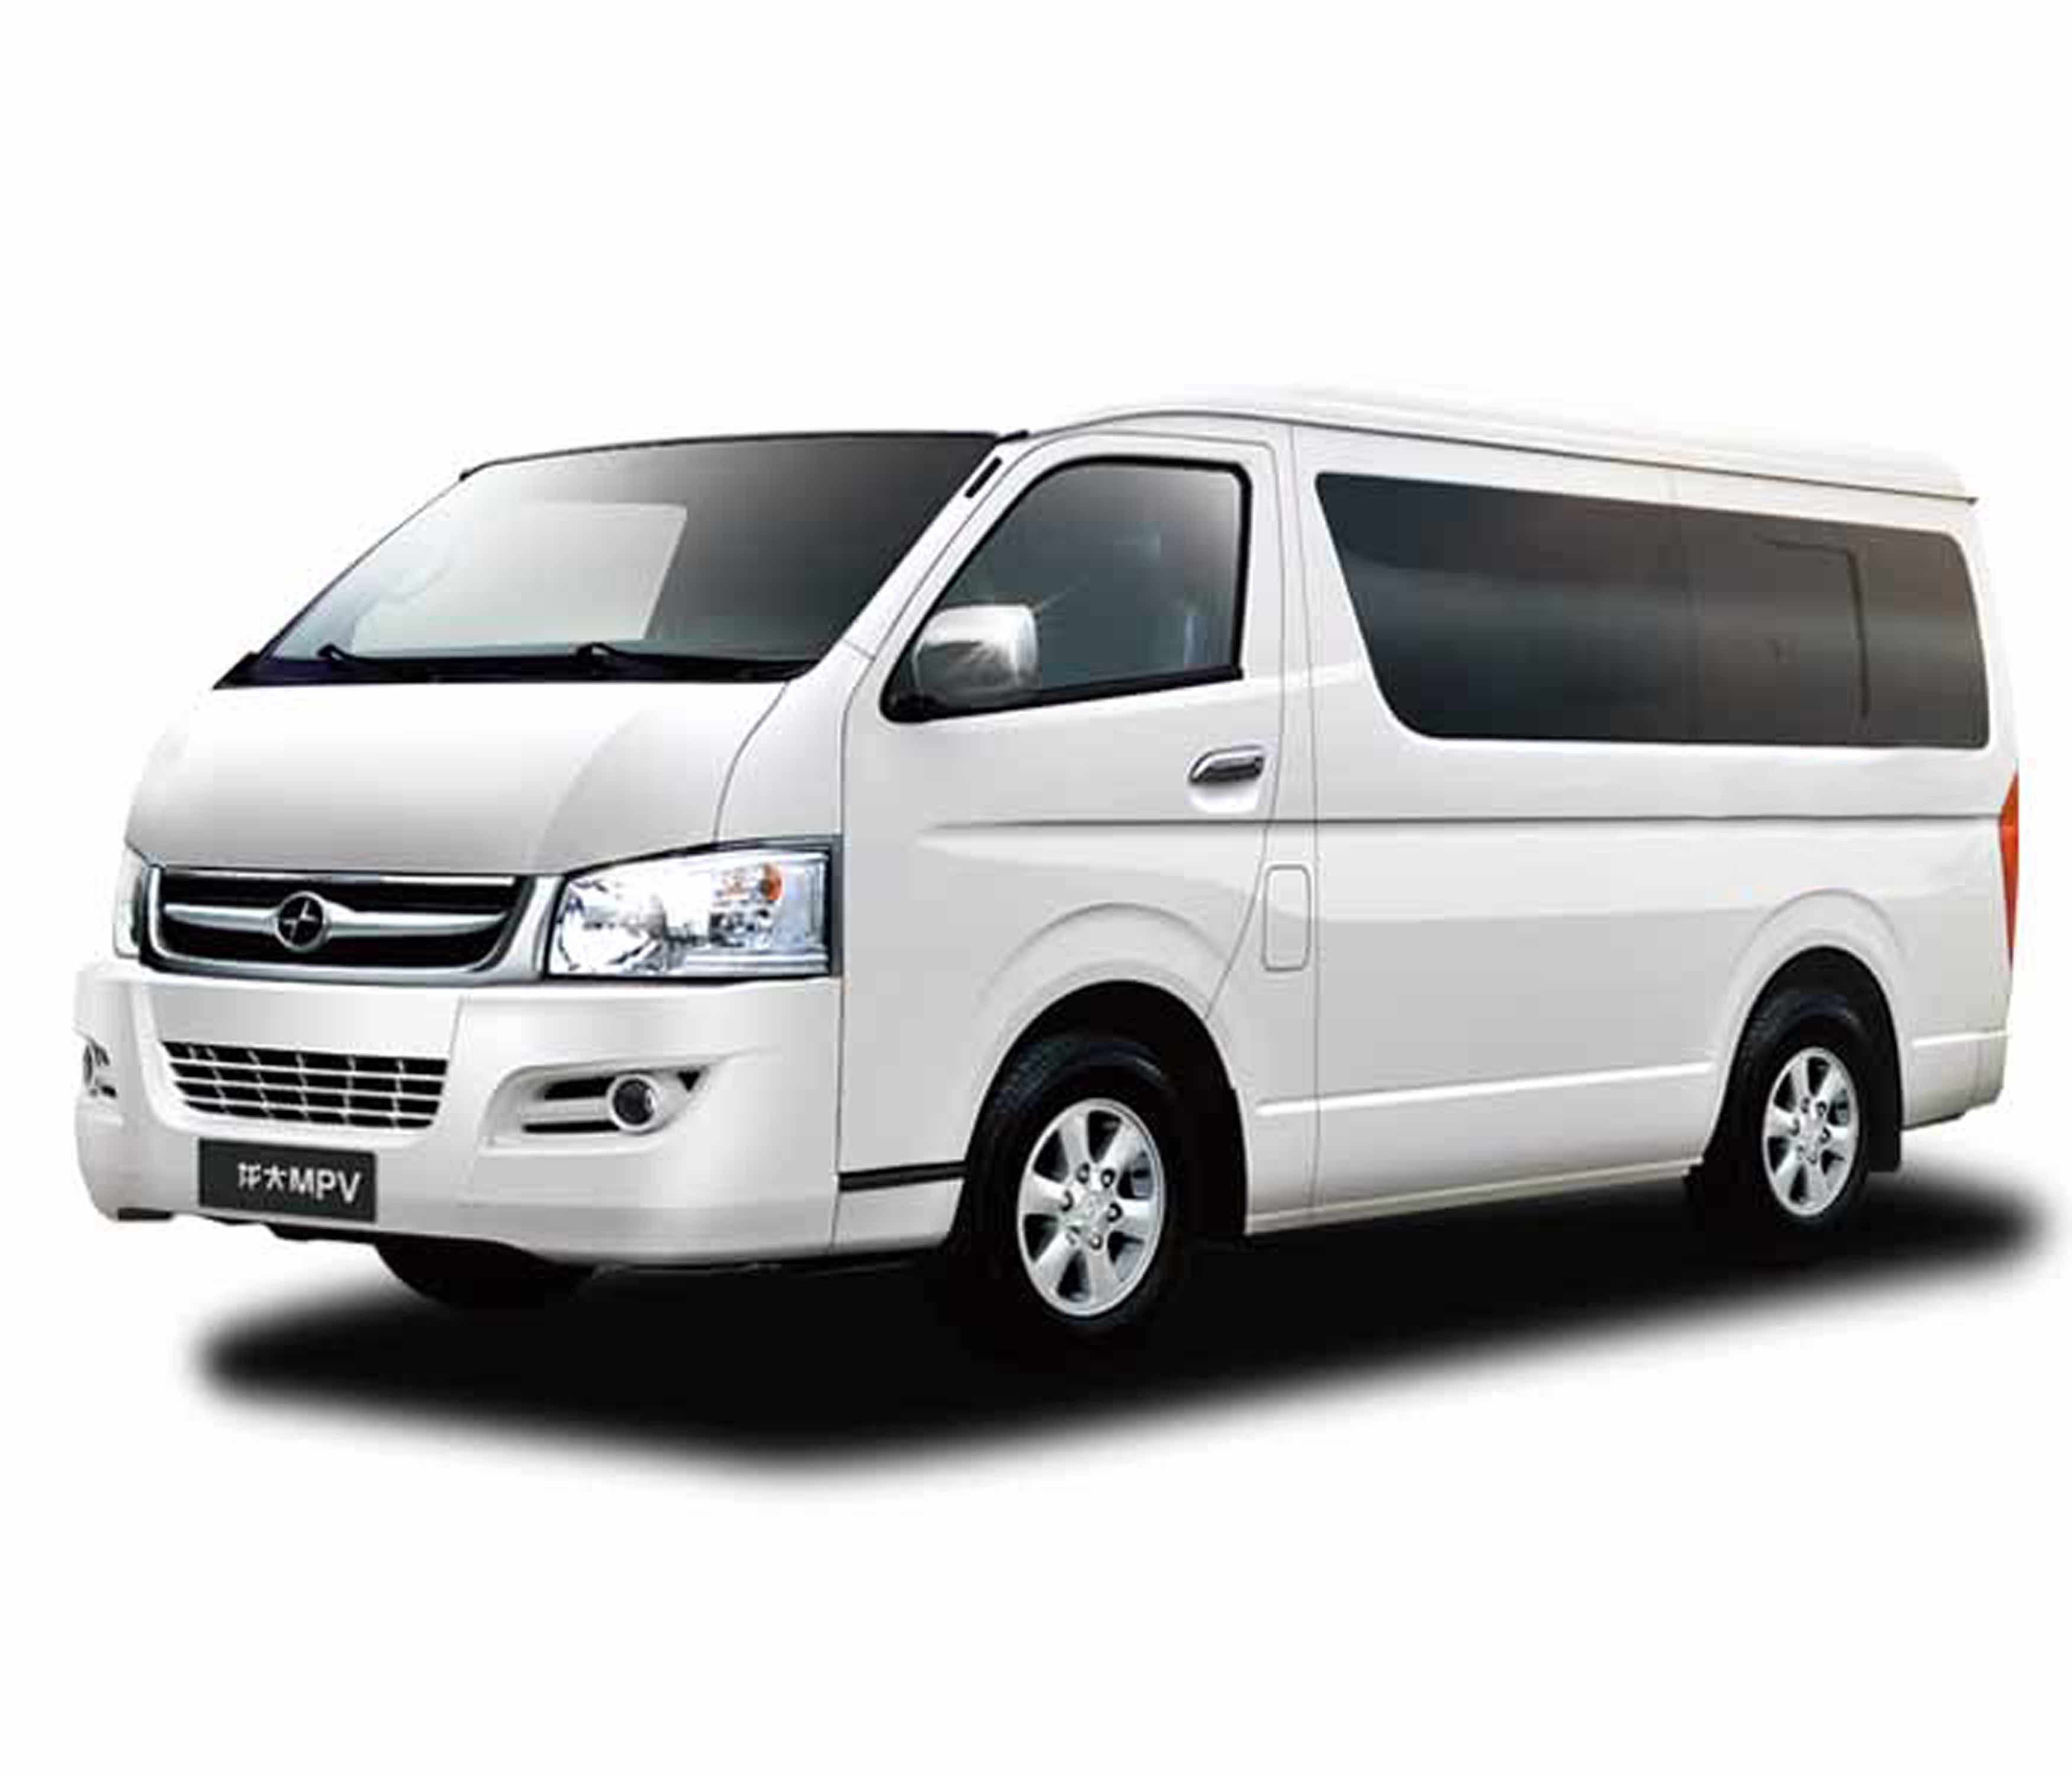 penang van rental with driver